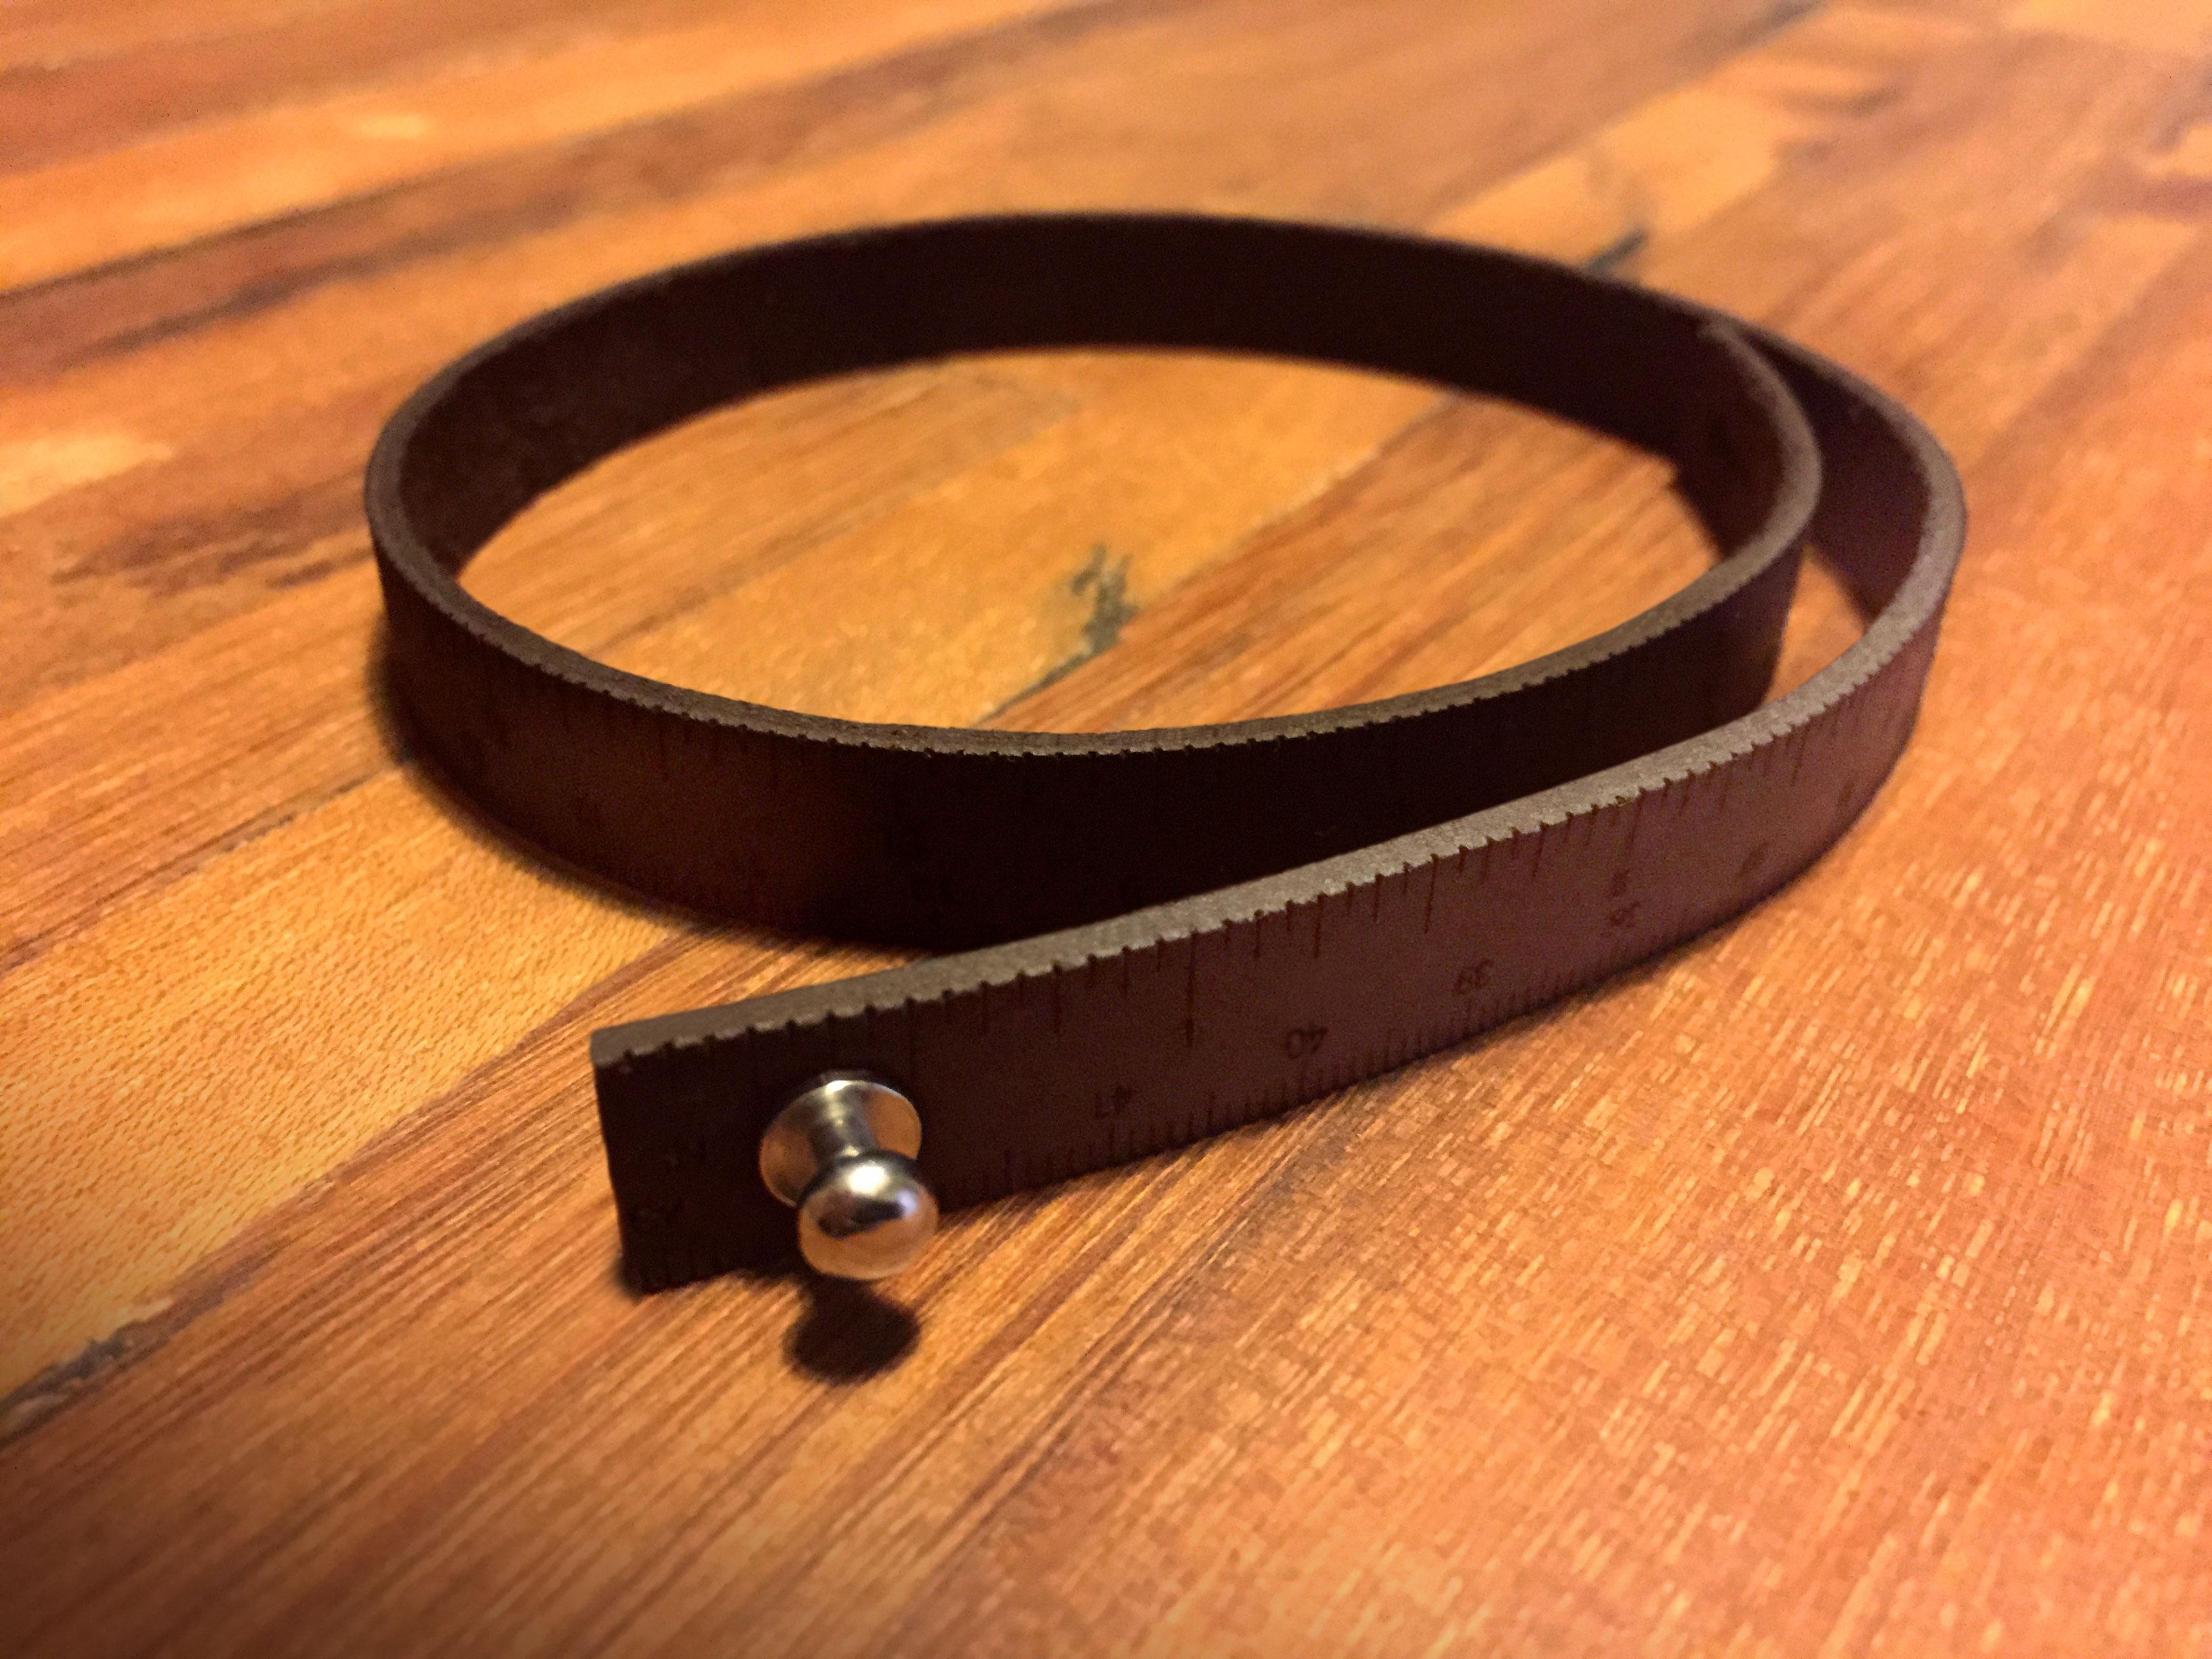 wrist-ruler-coil